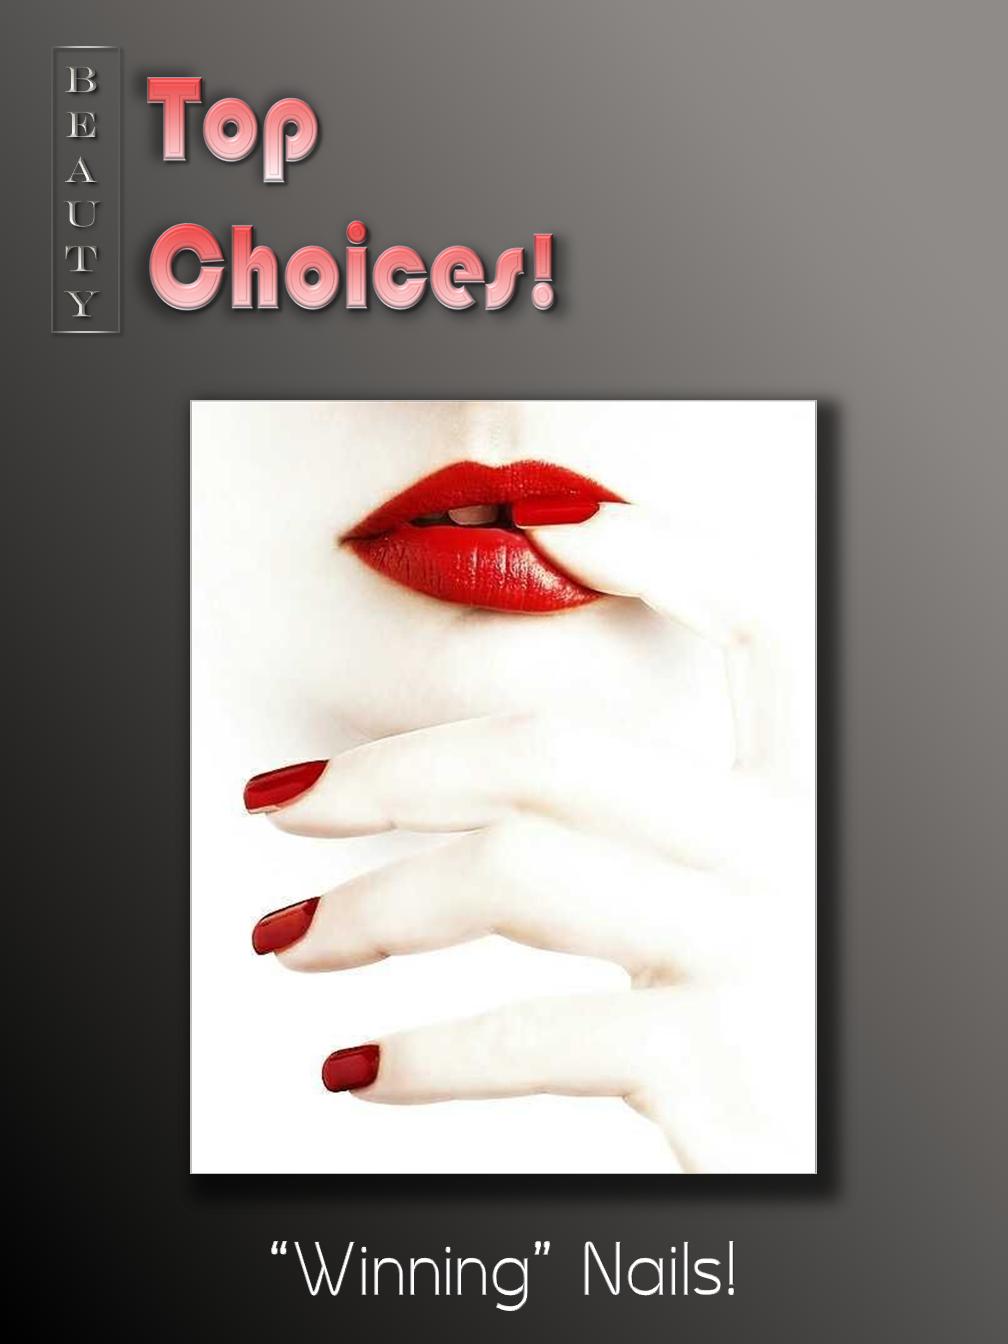 Top Choices